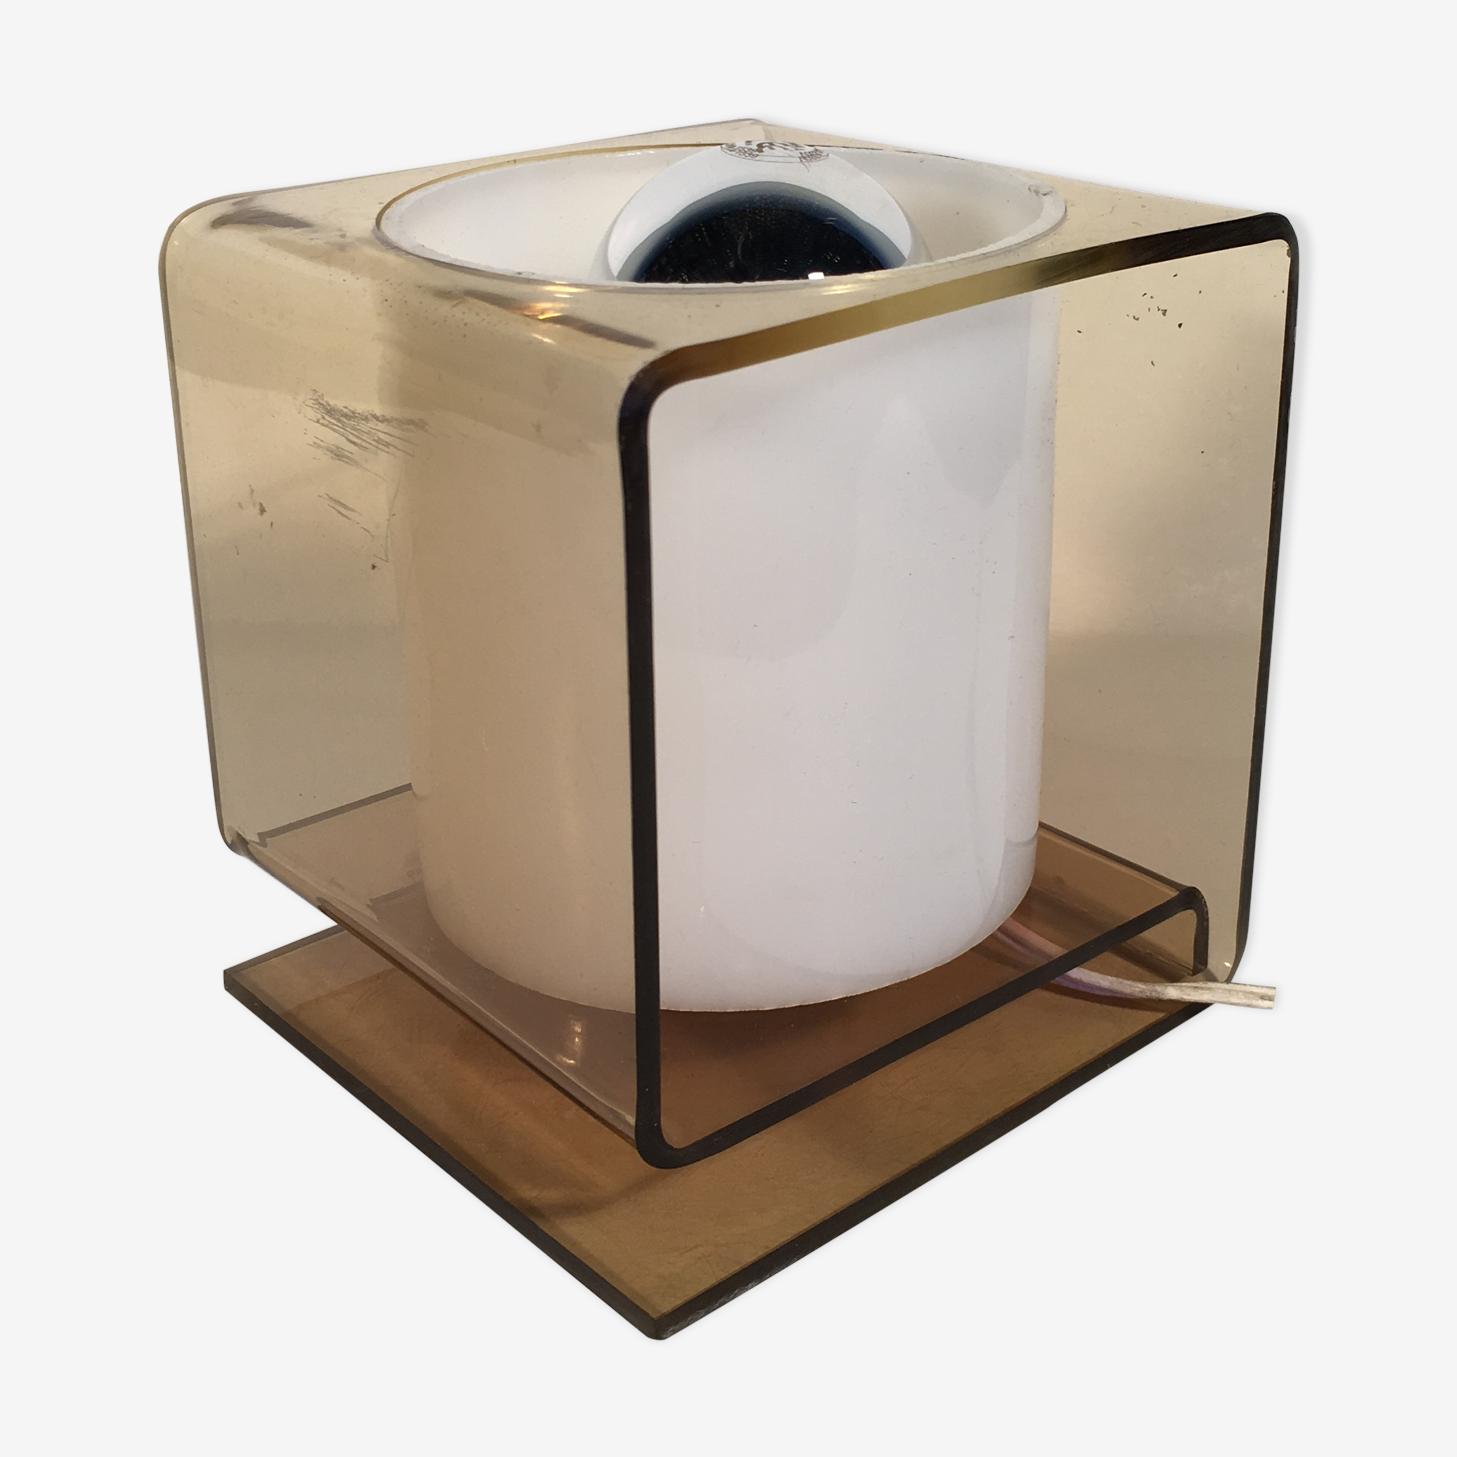 Petite Lampe Guzzini 1970 S Plexiglas Transparent Vintage